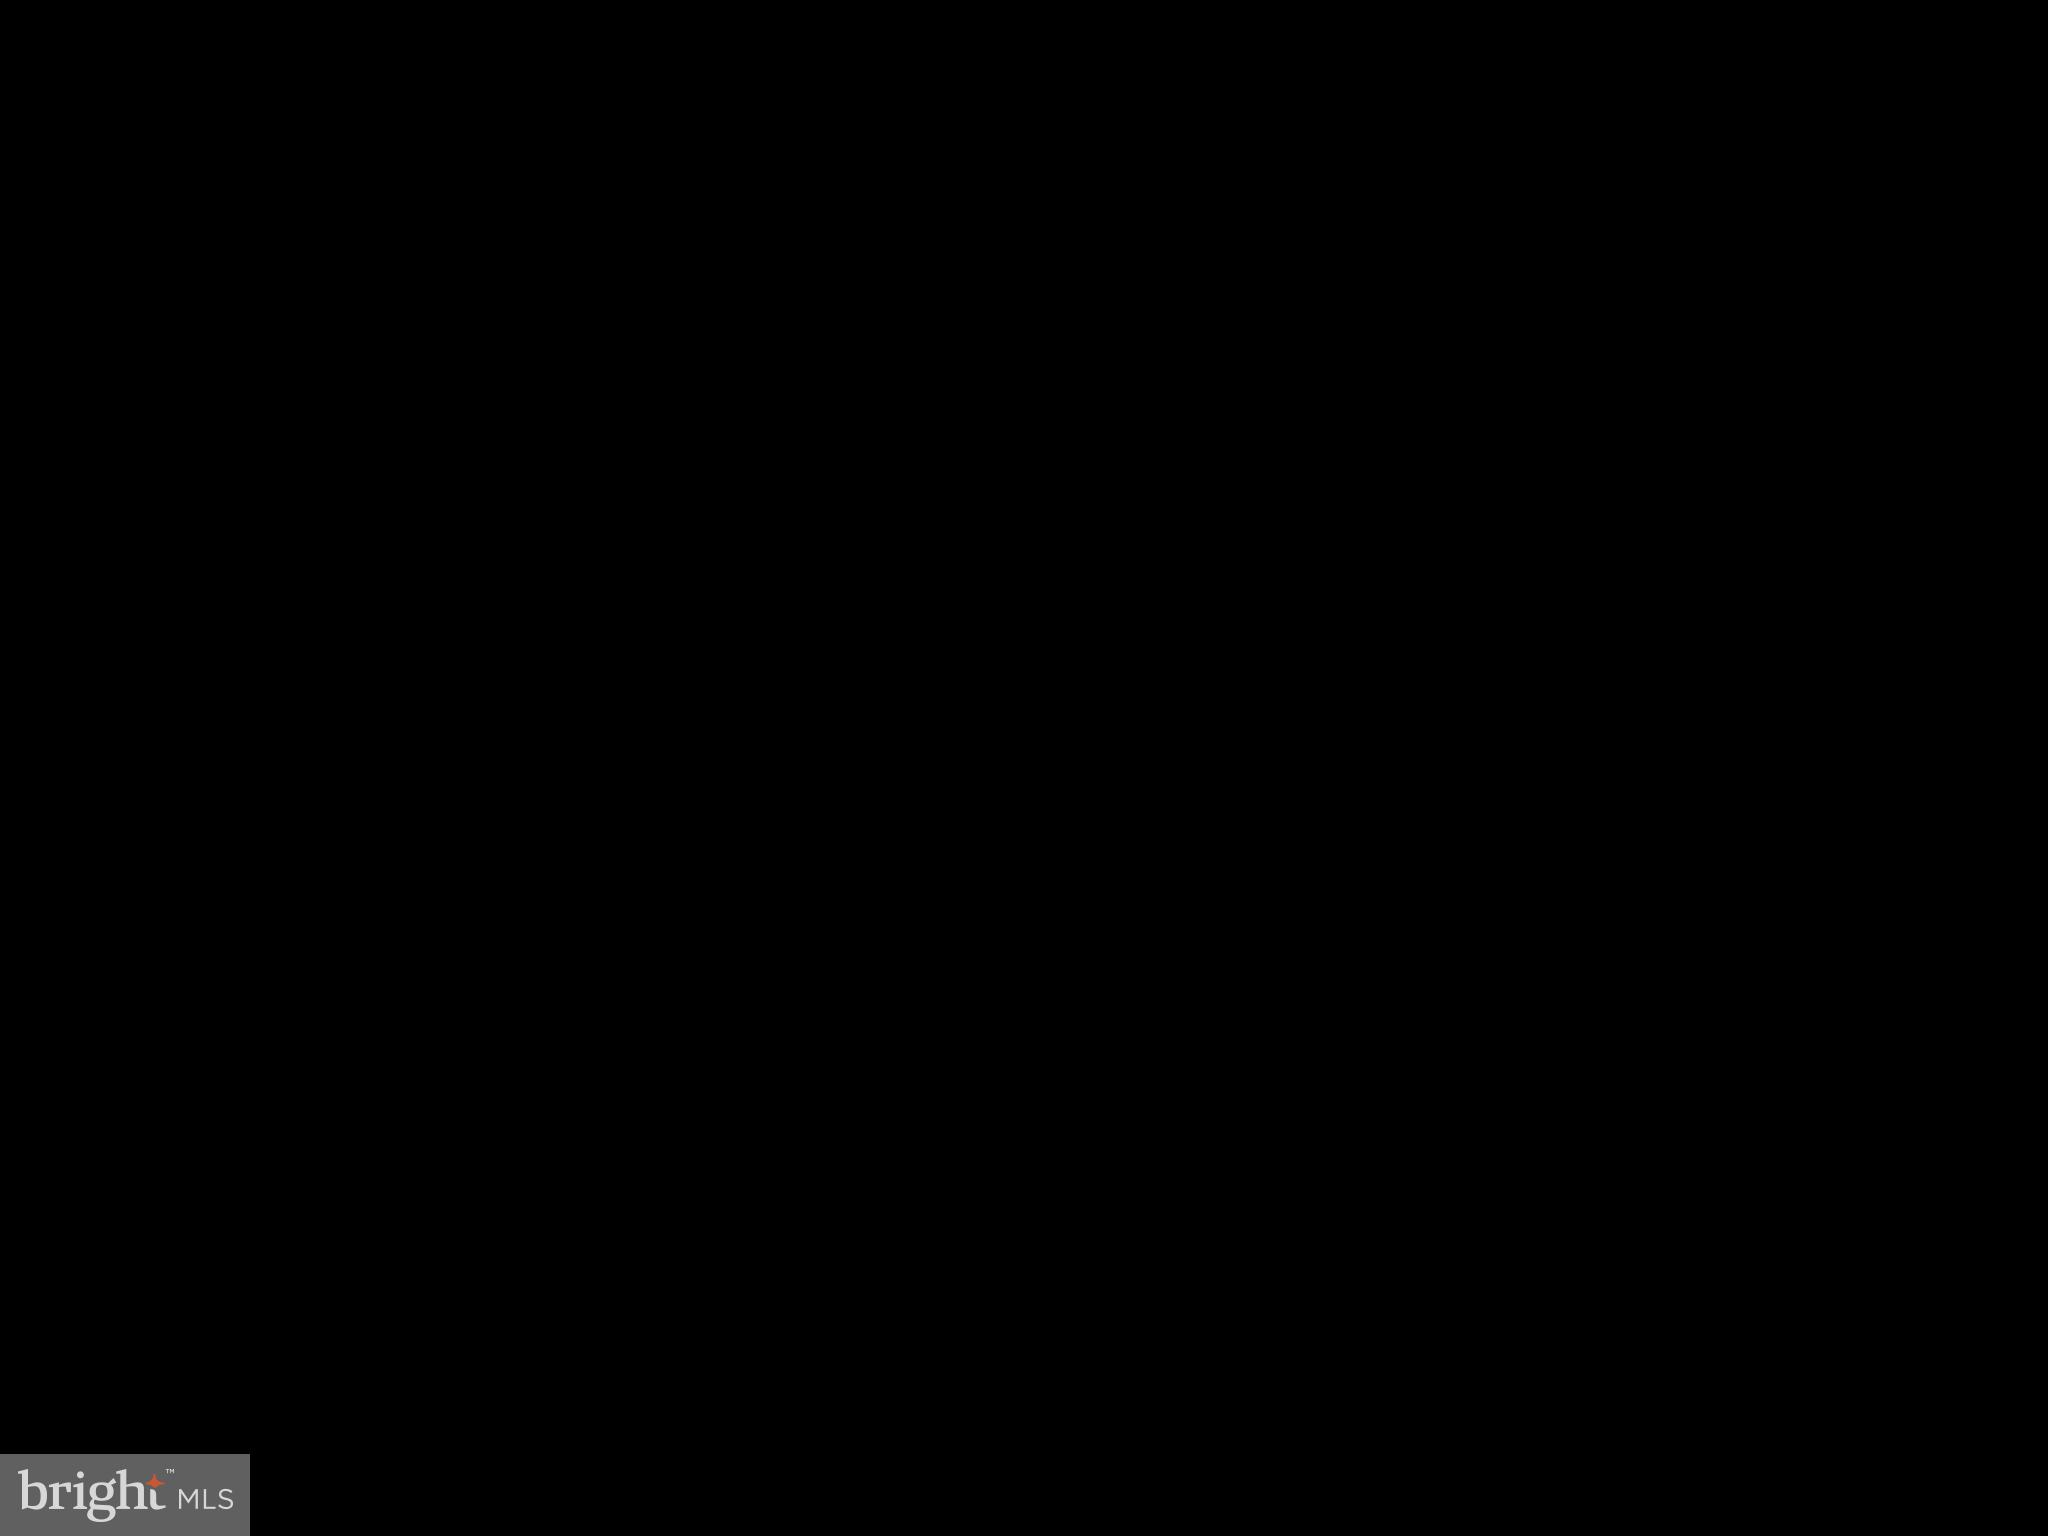 520 GROBES AVENUE, GLENOLDEN, PA 19036